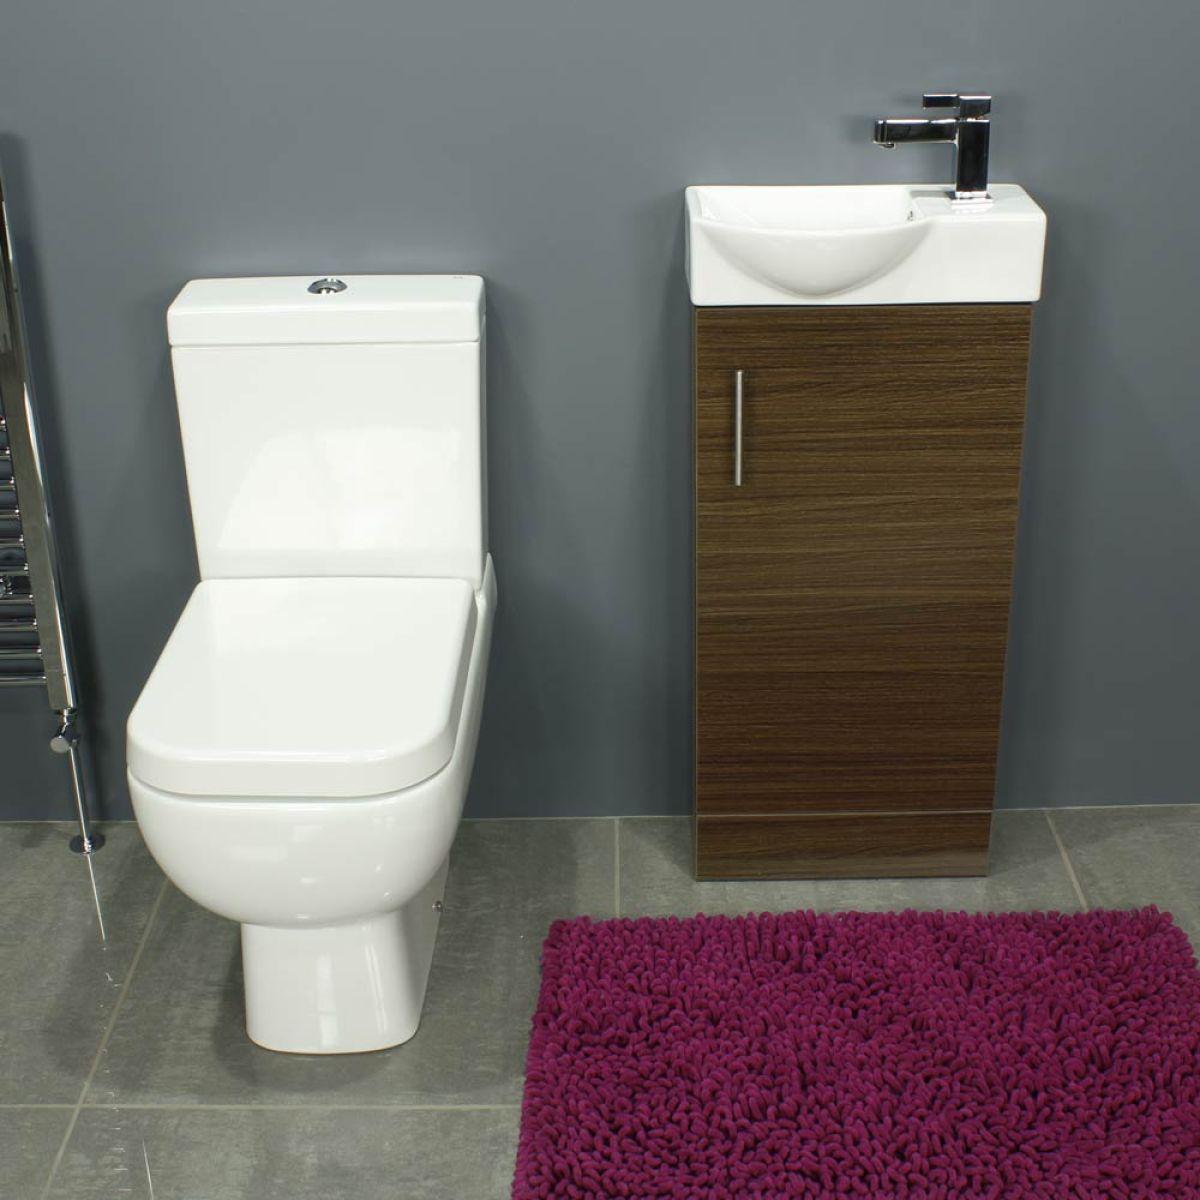 RAK Series 600 Close Coupled Toilet and 400 Series Walnut Mini Vanity Unit Front